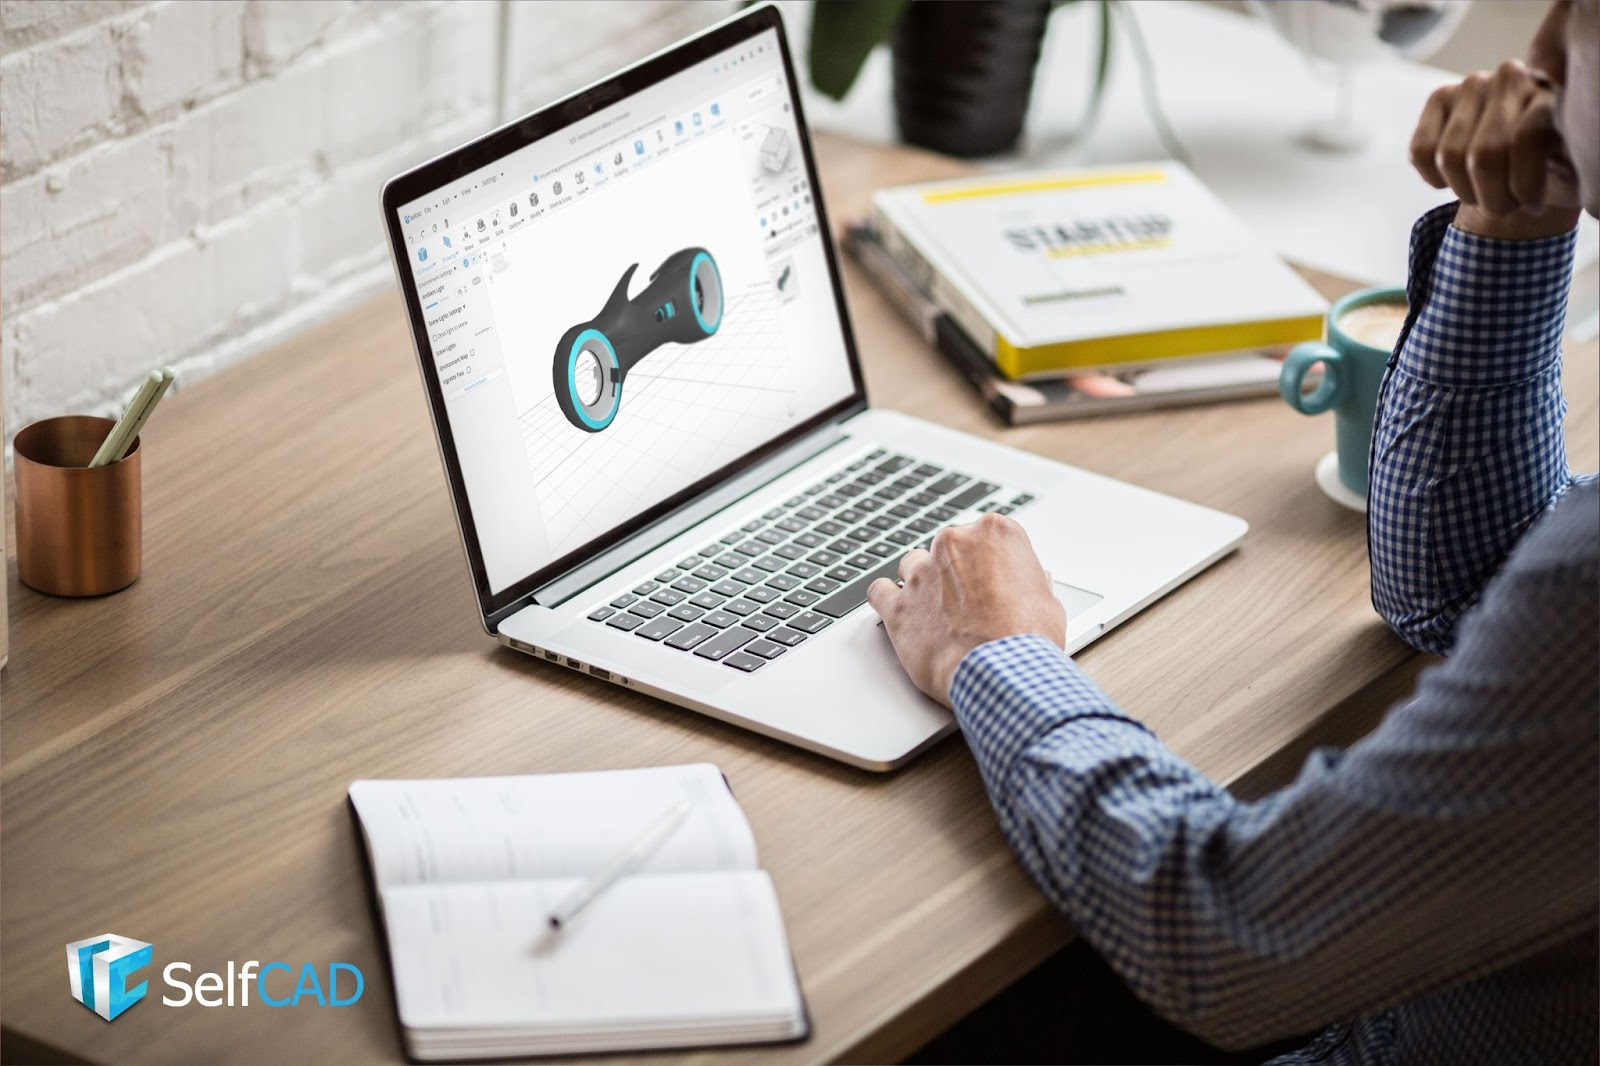 Negotiation skills freelance 3D designers need